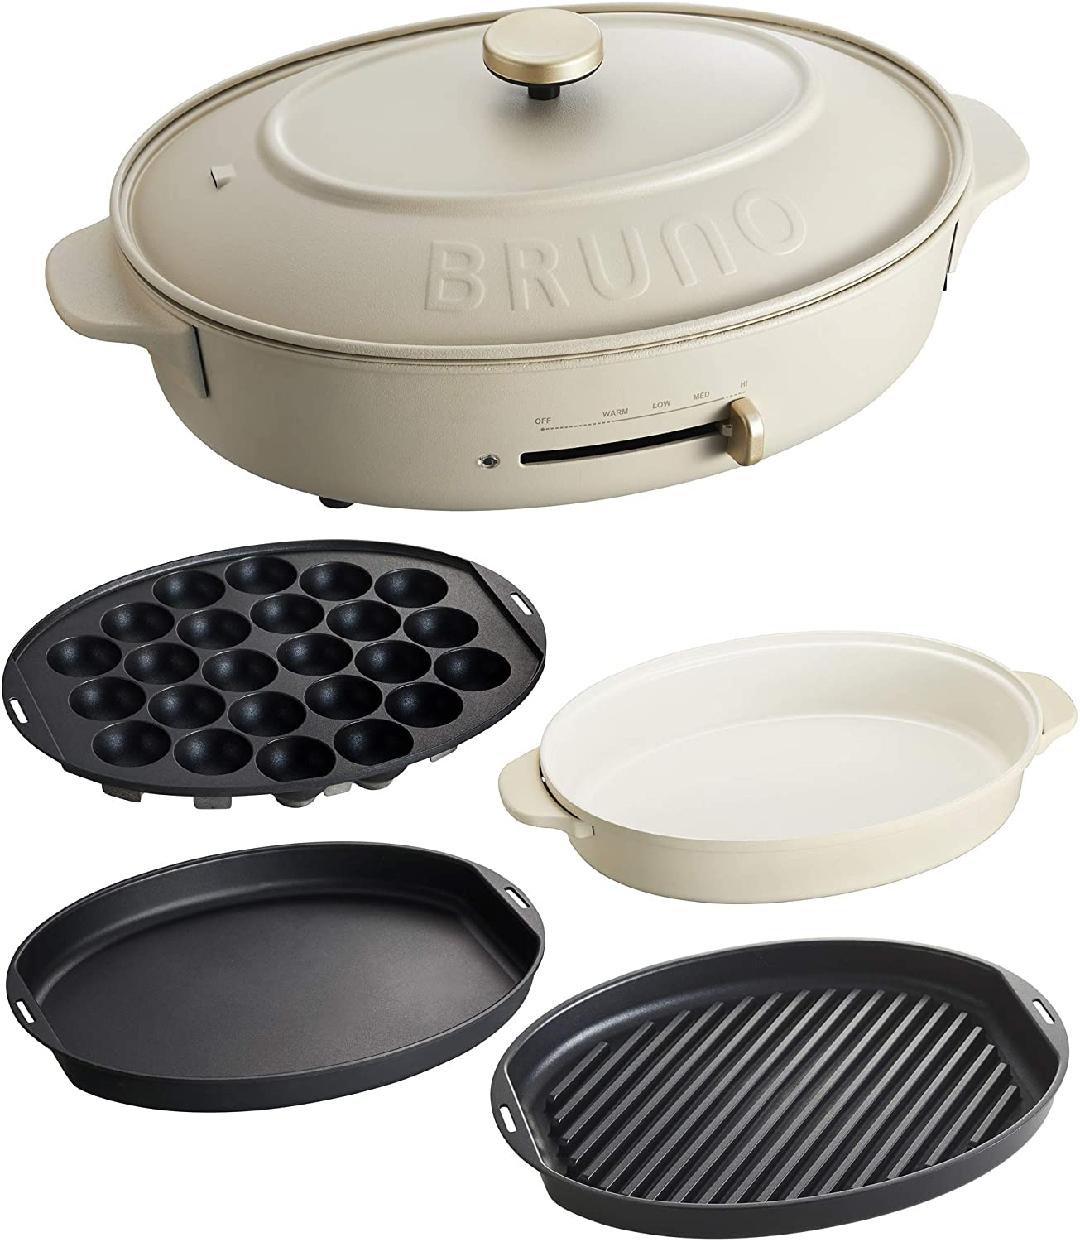 BRUNO(ブルーノ) オーバルホットプレート グレージュ  BOE053-GRGの商品画像